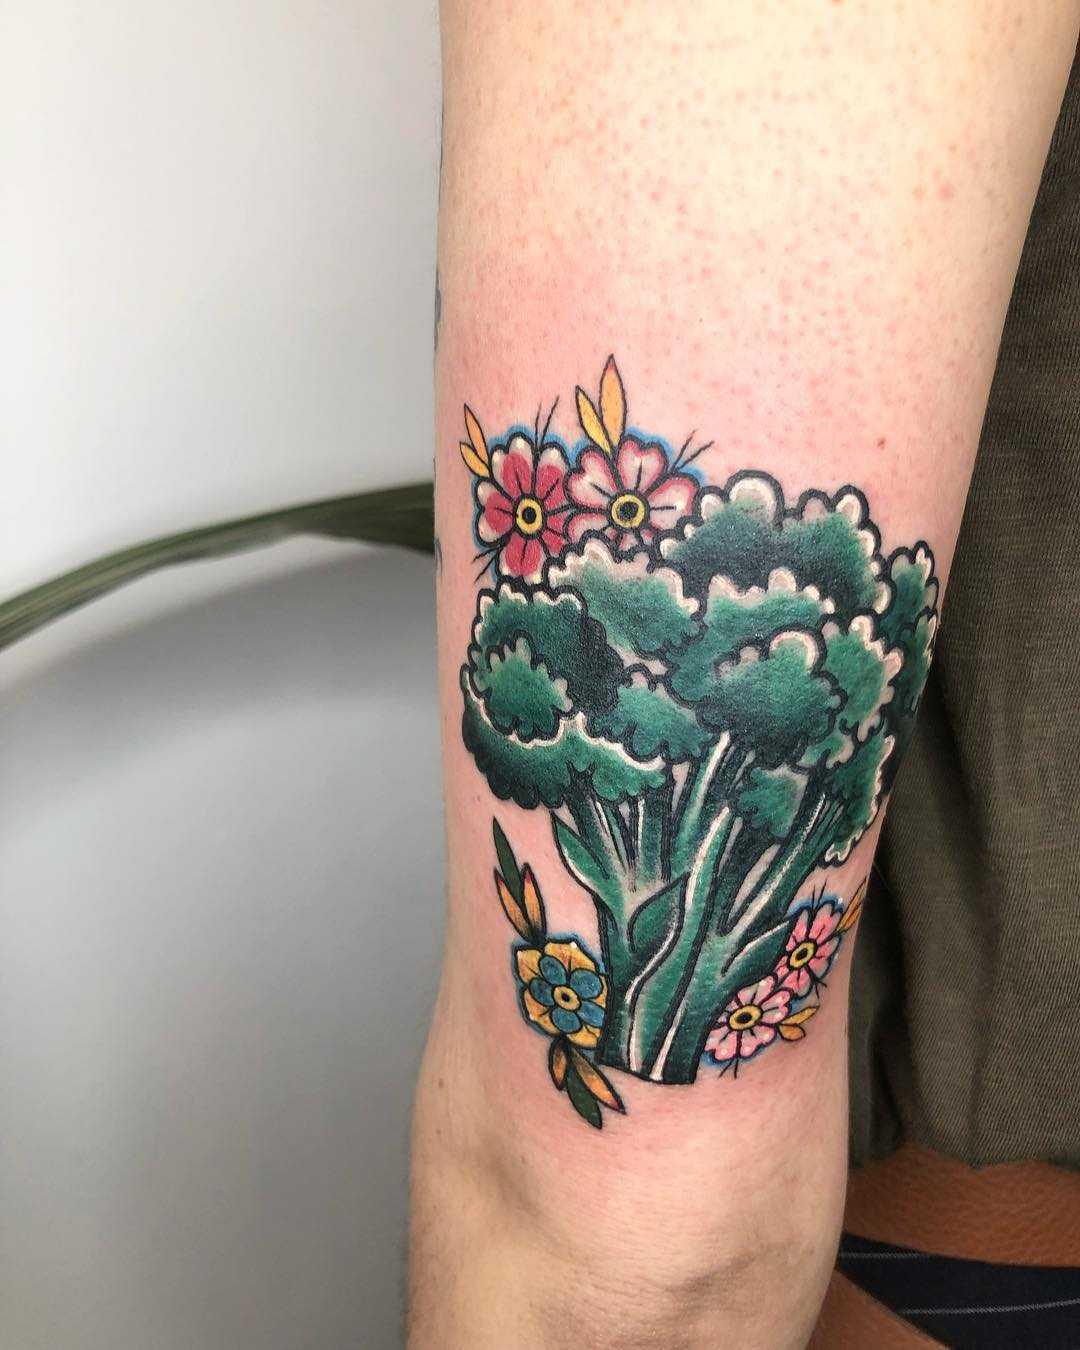 Traditional broccoli tattoo by Lara Simonetta